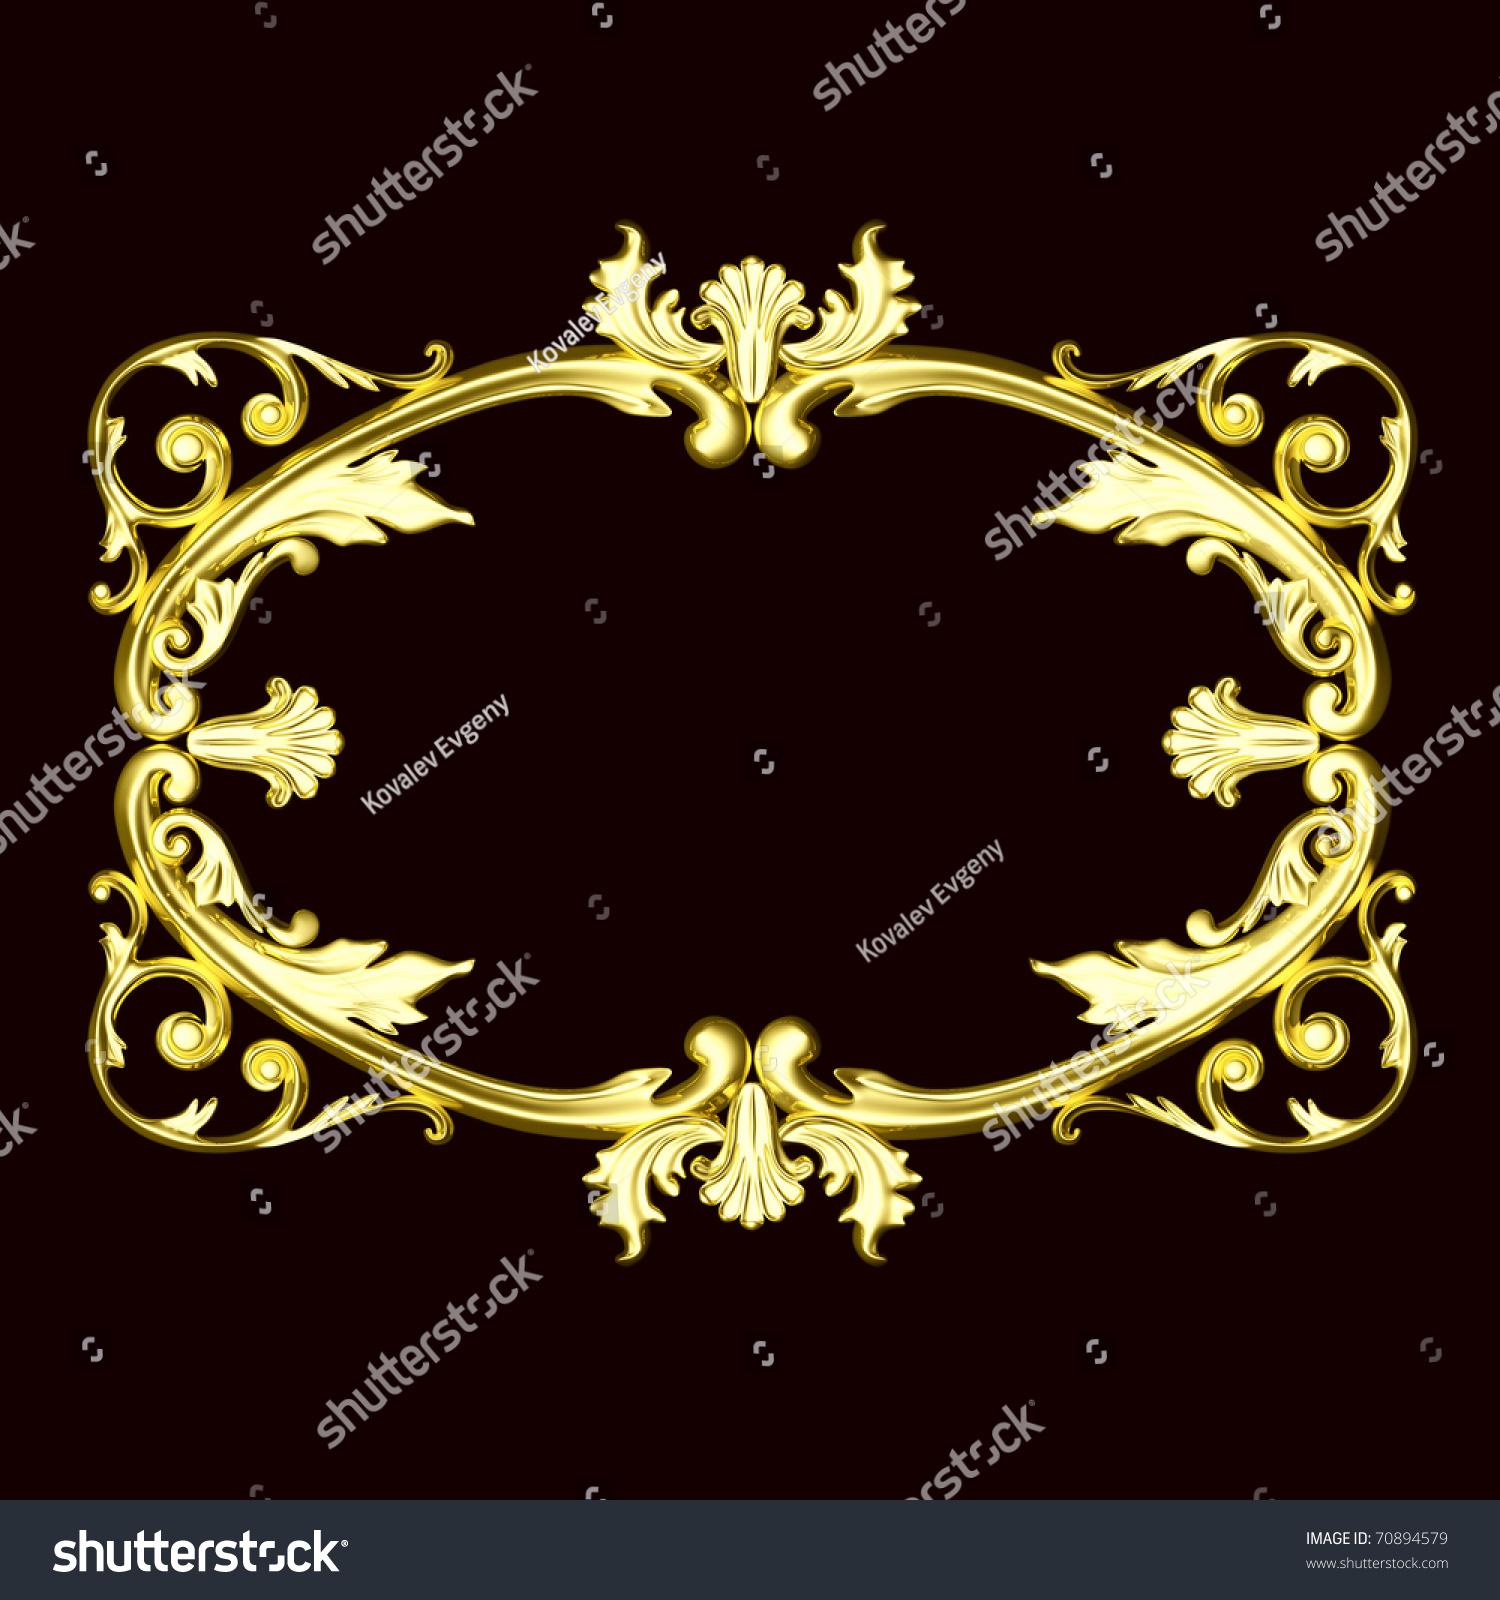 3 D Gold Ornament Sculptural Form On Stock Illustration 70894579 1500x1600